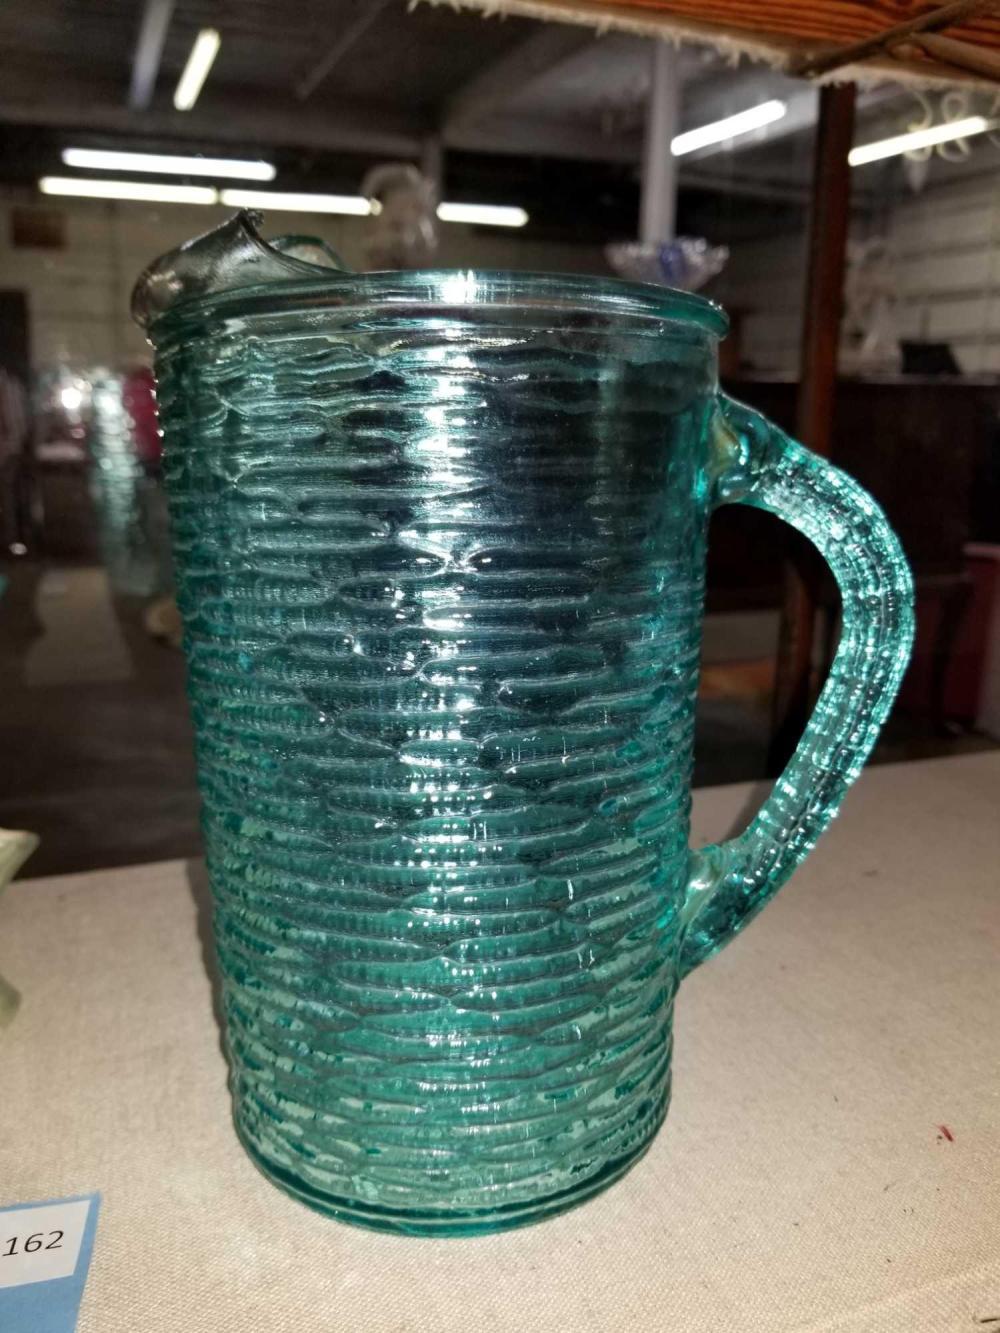 RETRO PRESSED RIPPLED WAVE BLUE-GREEN LEMONADE PITCHER